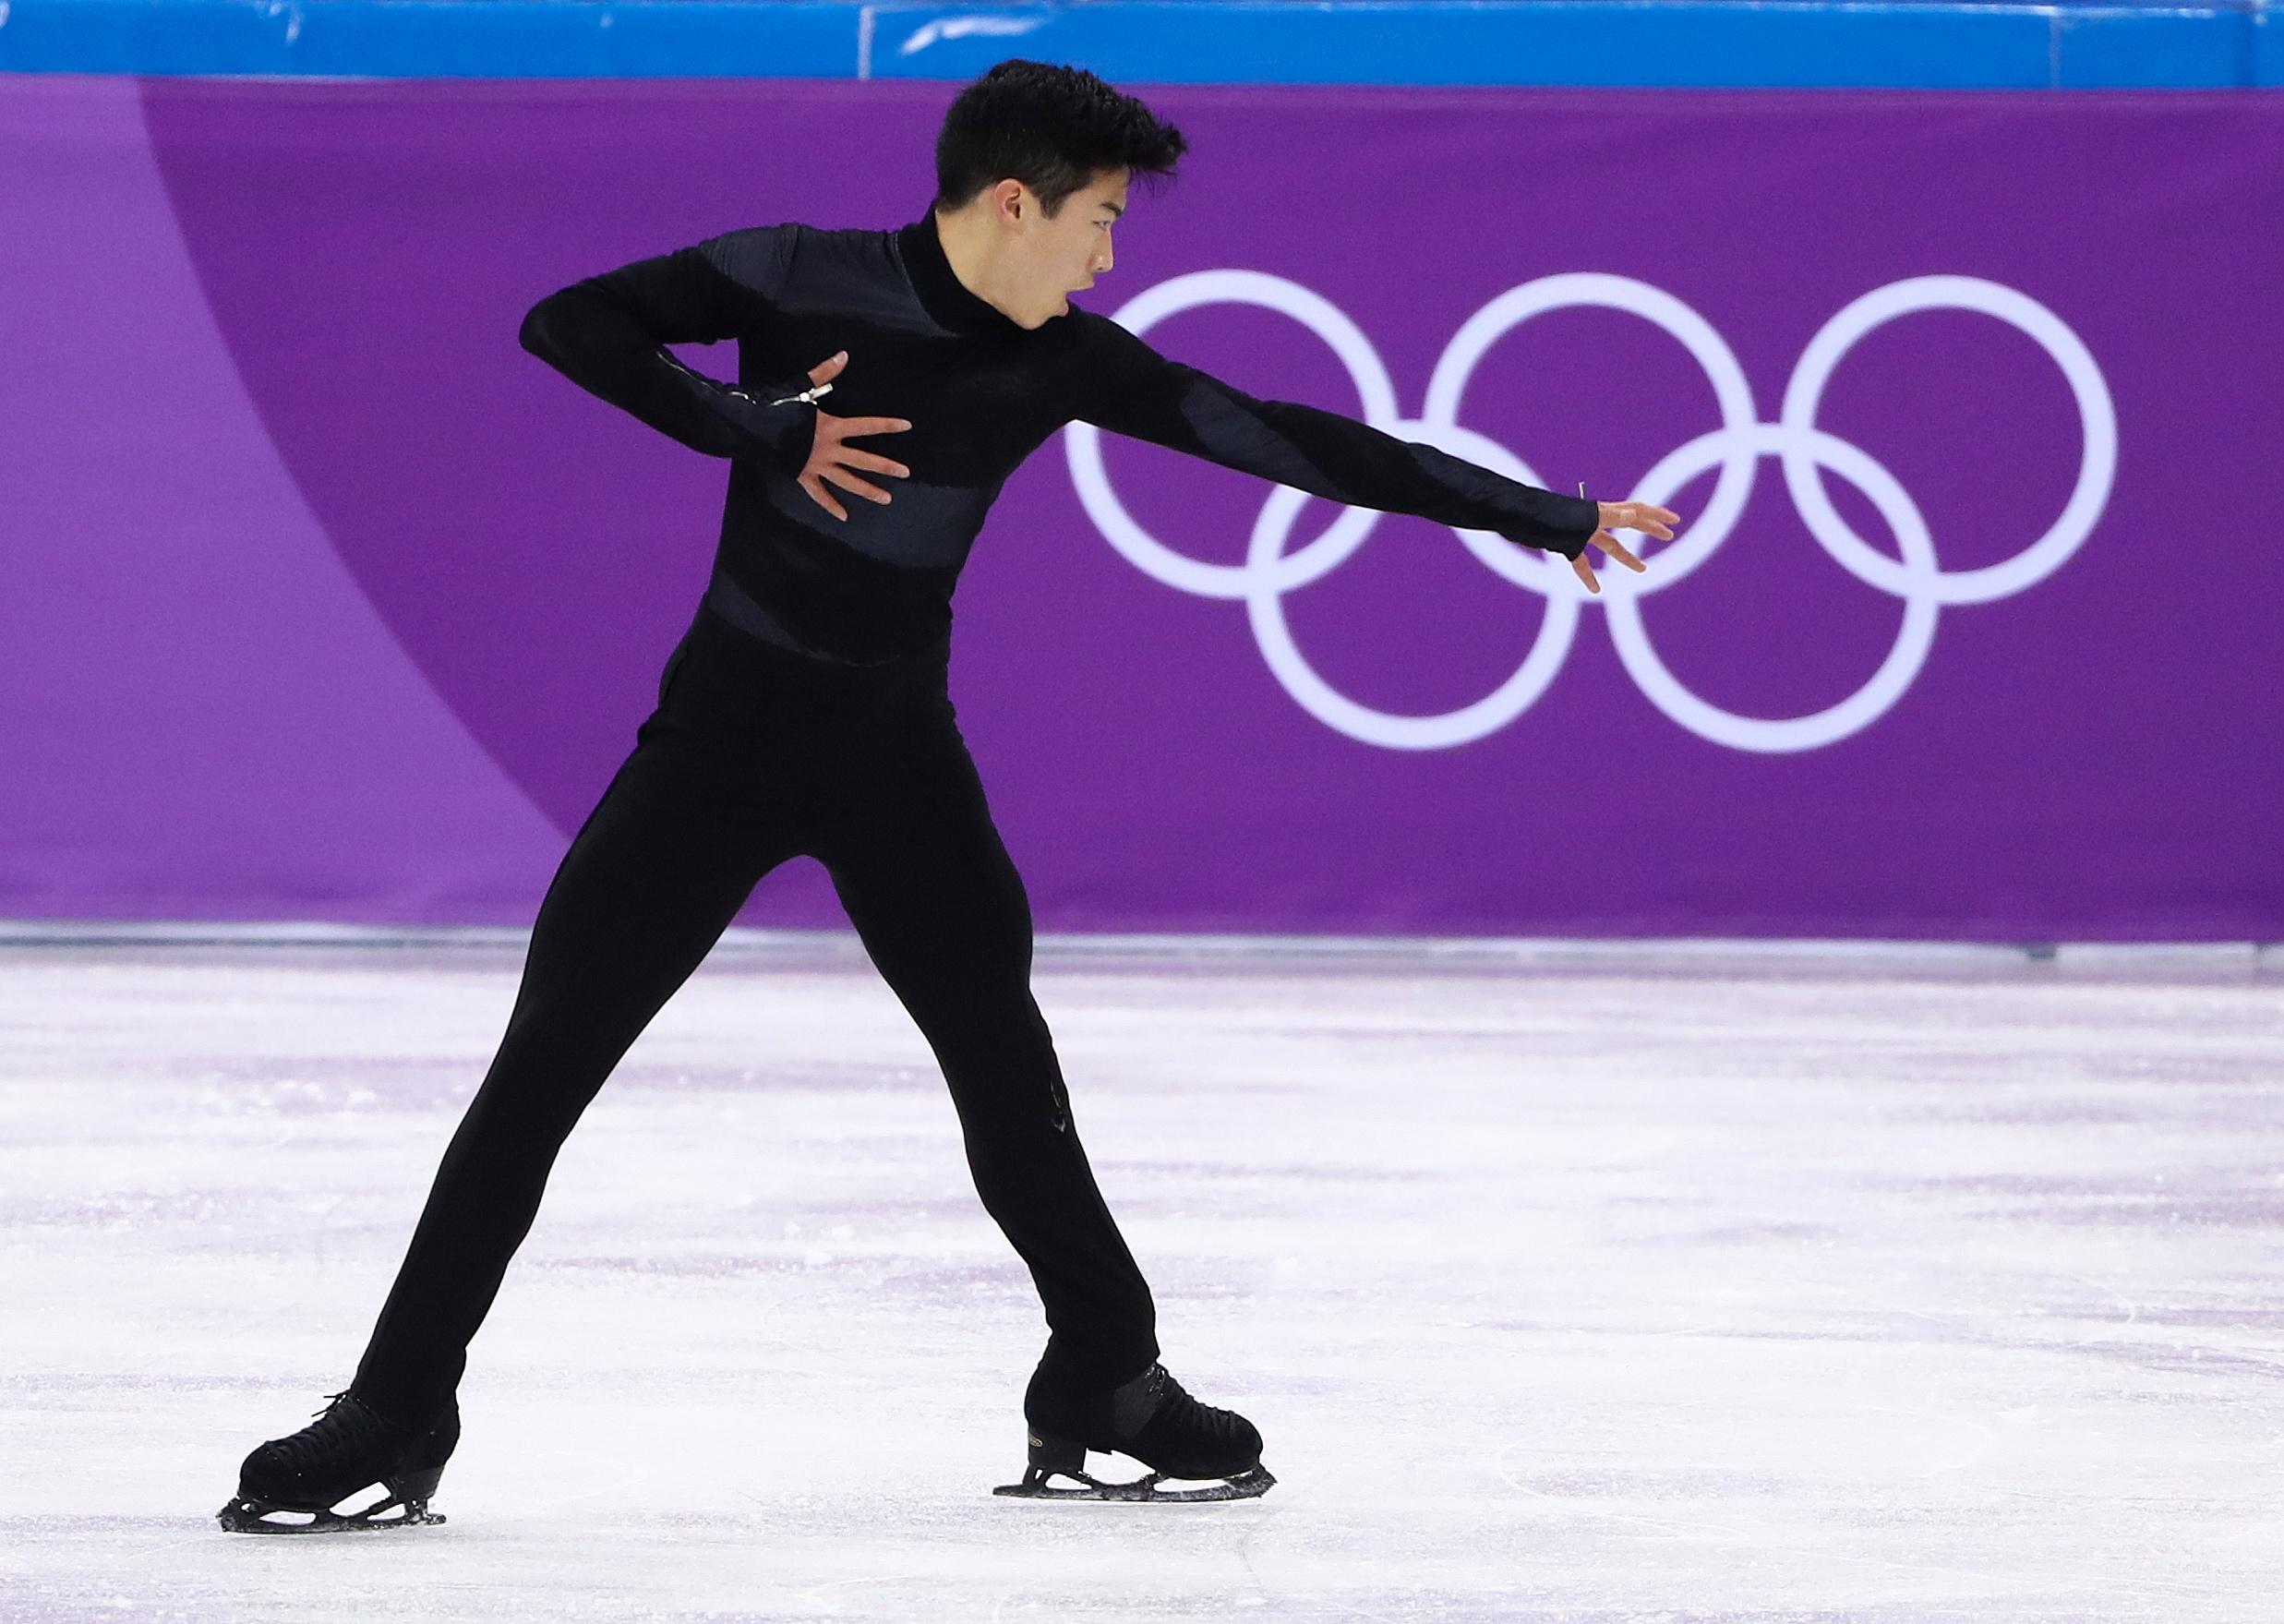 2018 Winter Olympic Games, Figure Skating: Men Single Skating Short Program Team Event